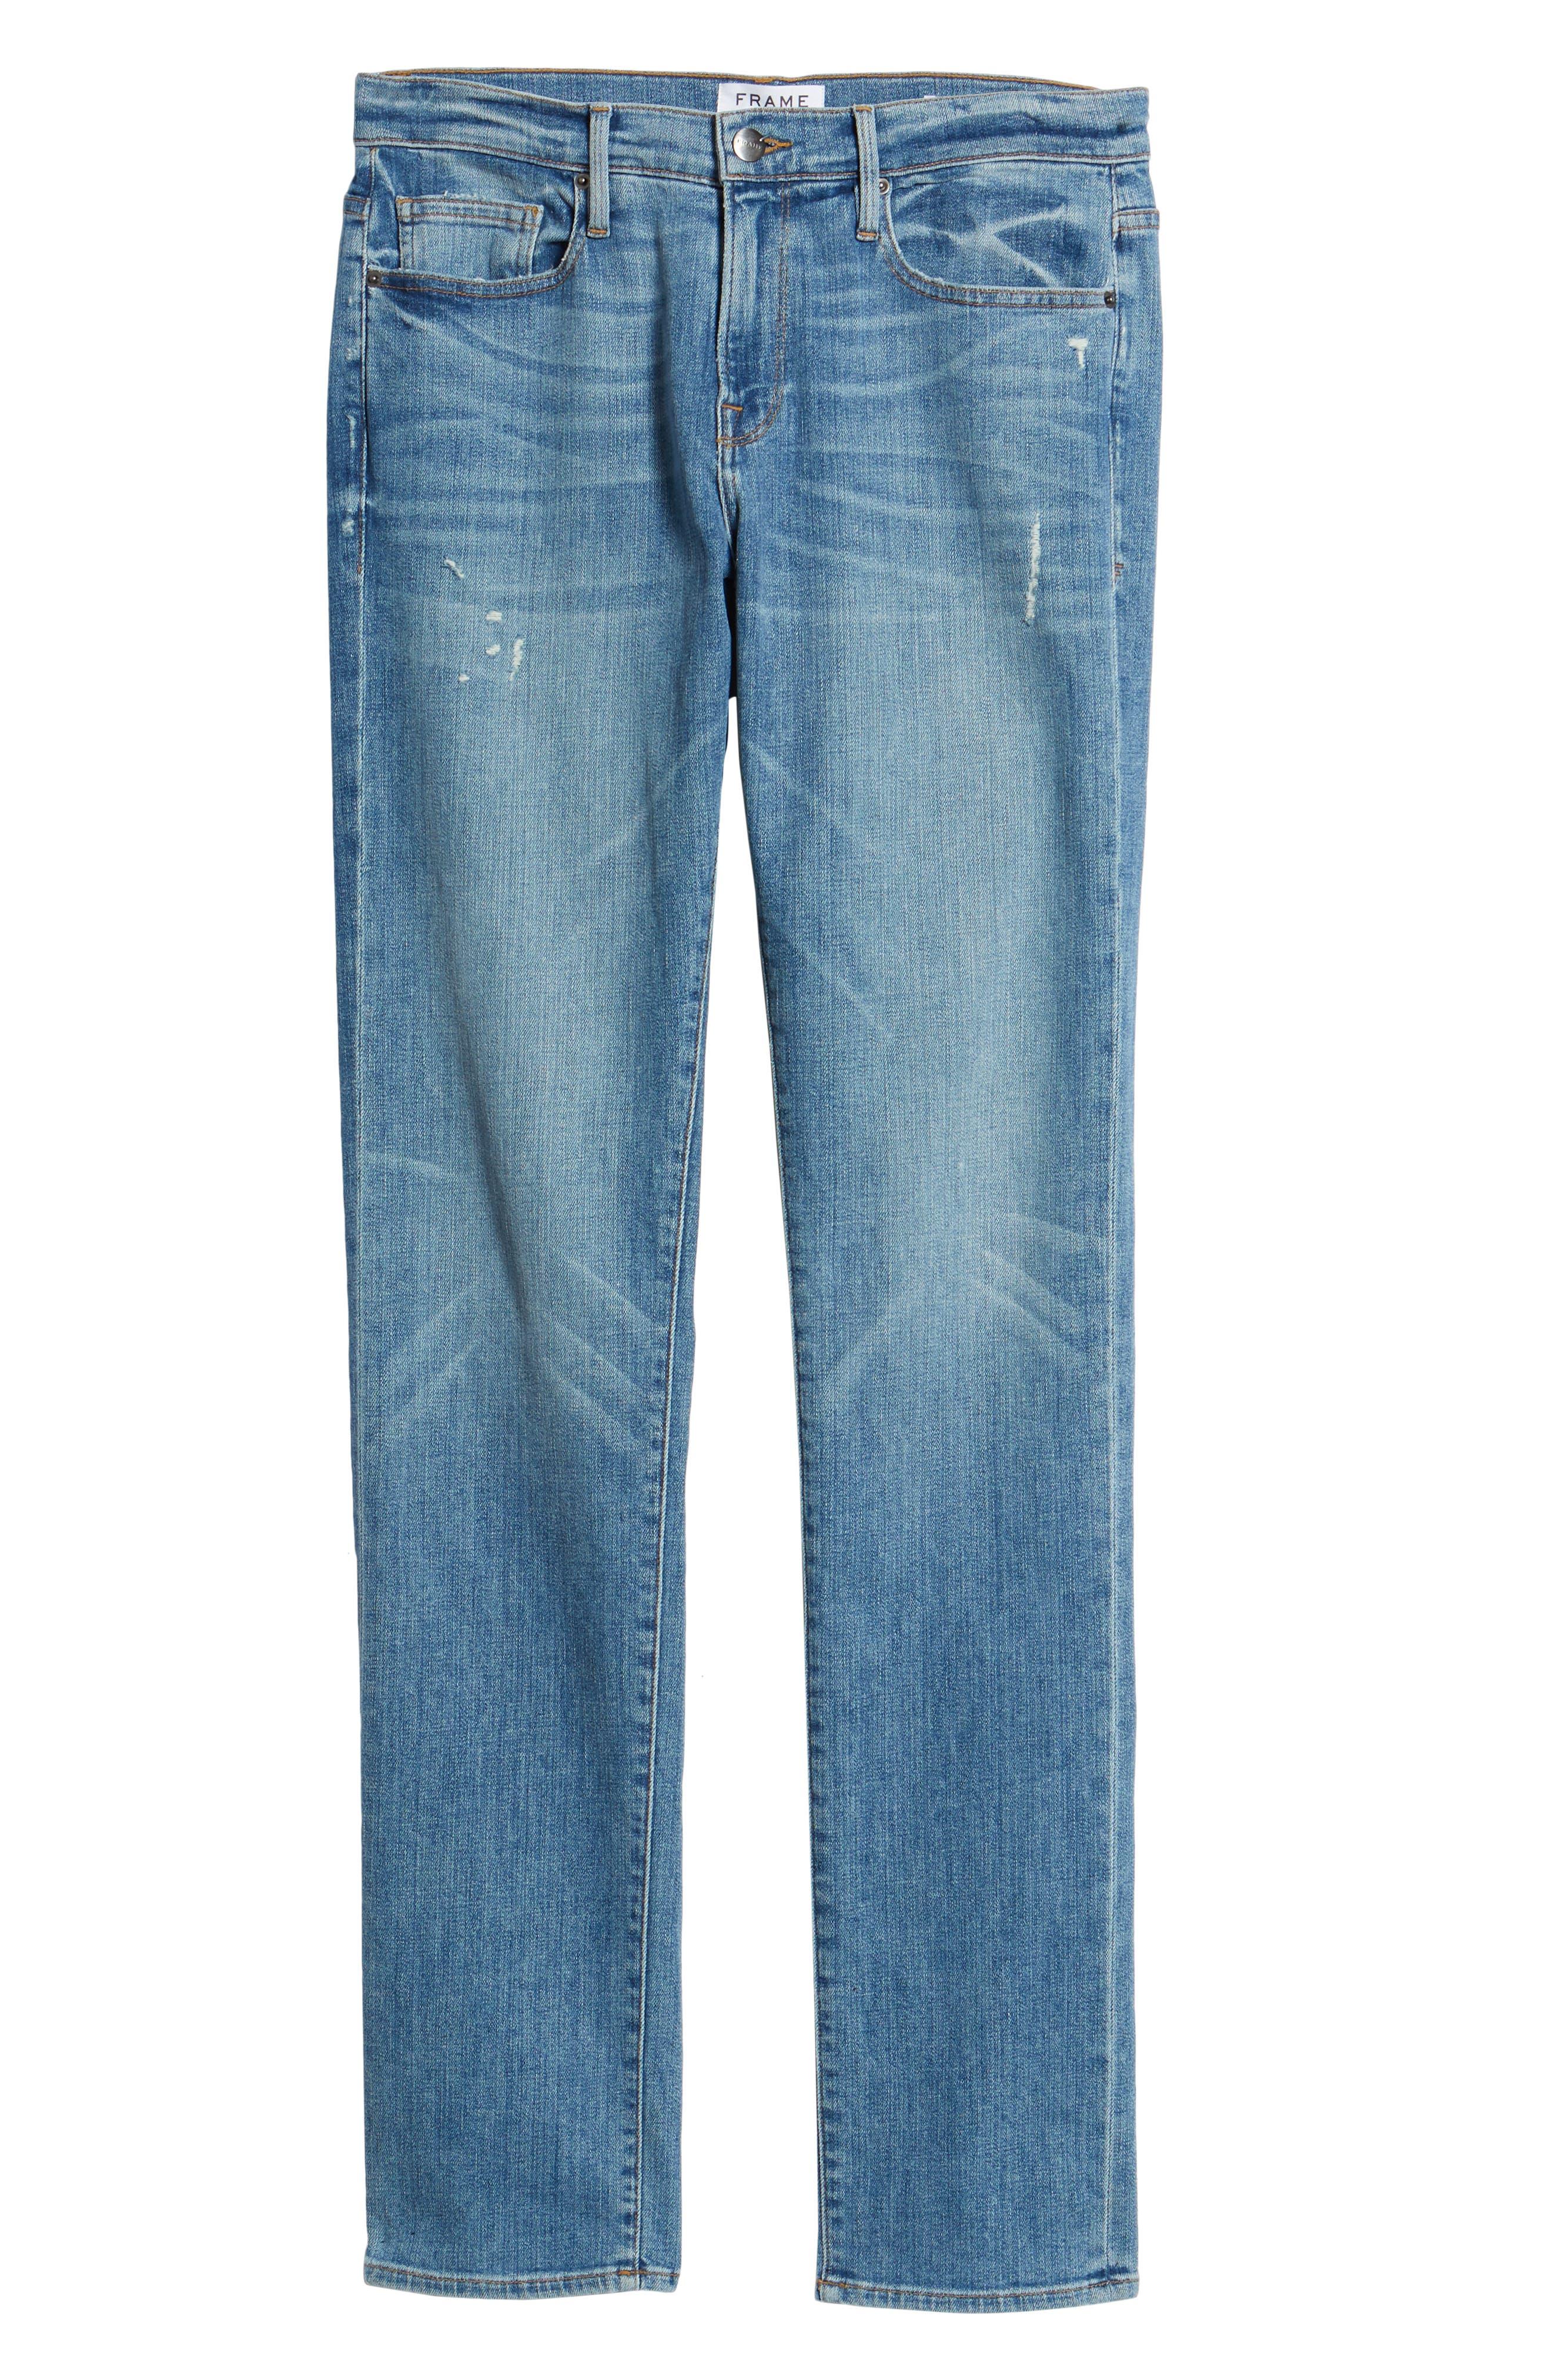 L'Homme Slim Straight Fit Jeans,                             Alternate thumbnail 6, color,                             Russel Cave